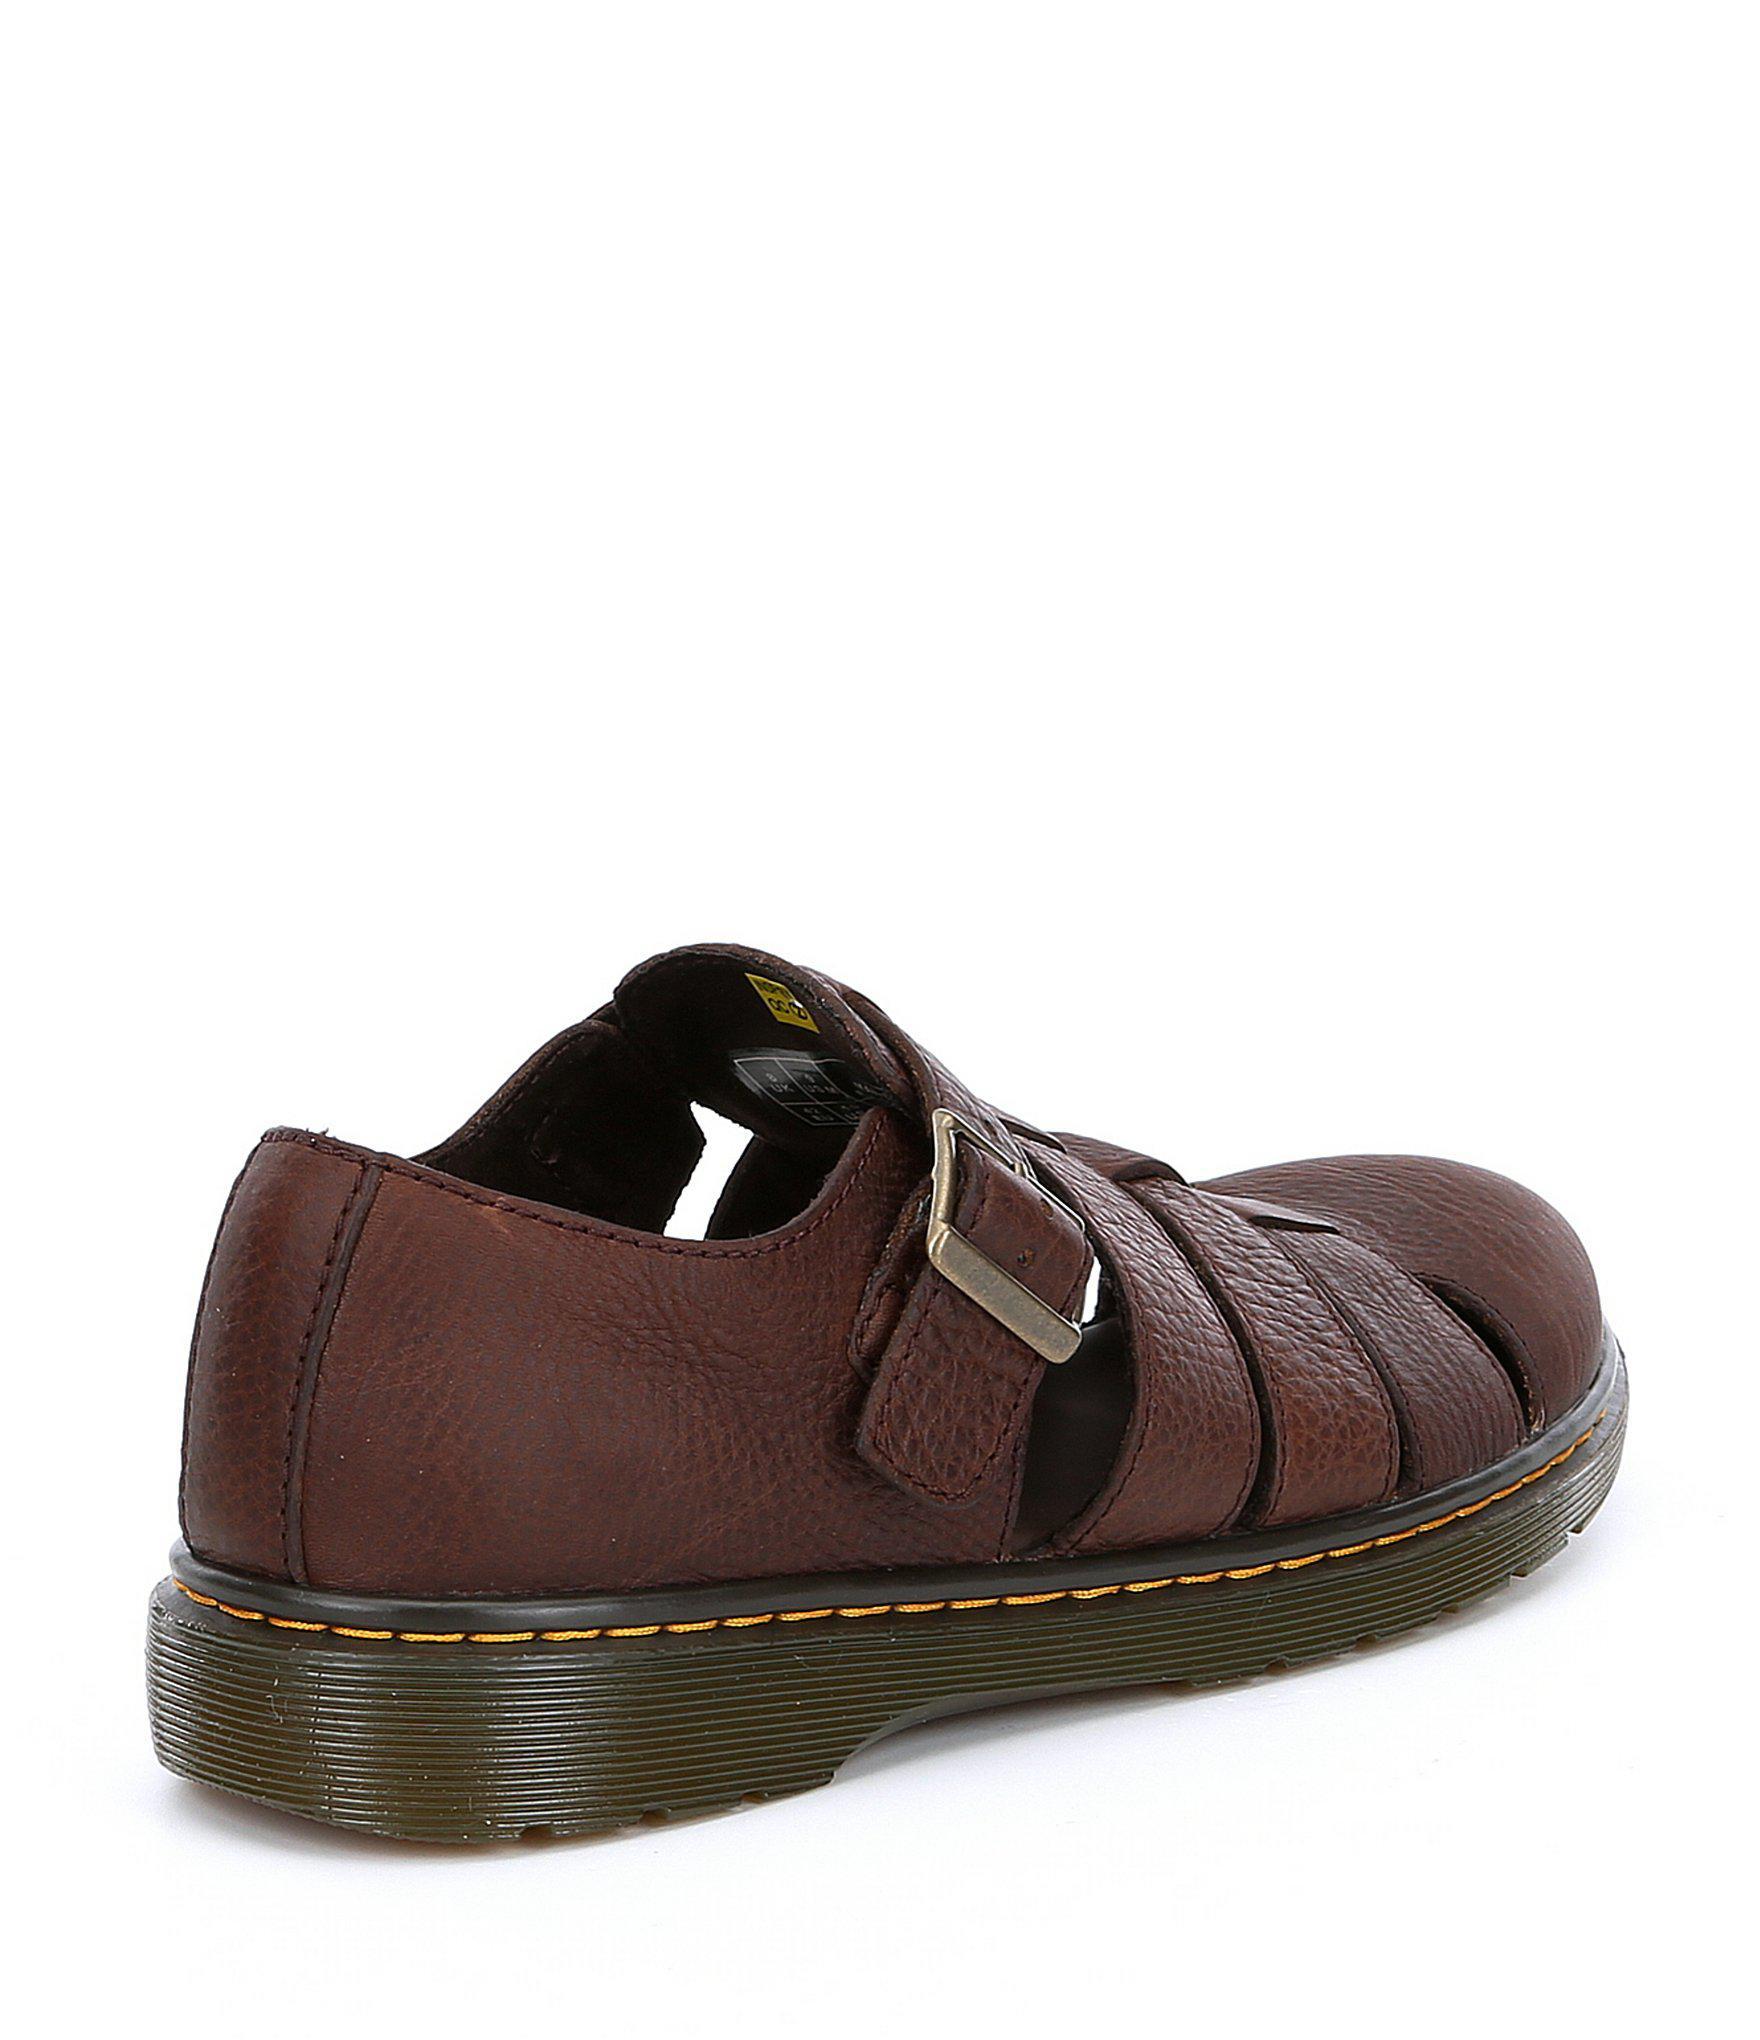 b6095aa9ed7 Dr. Martens Brown Men's Fenton Fisherman Sandals for men